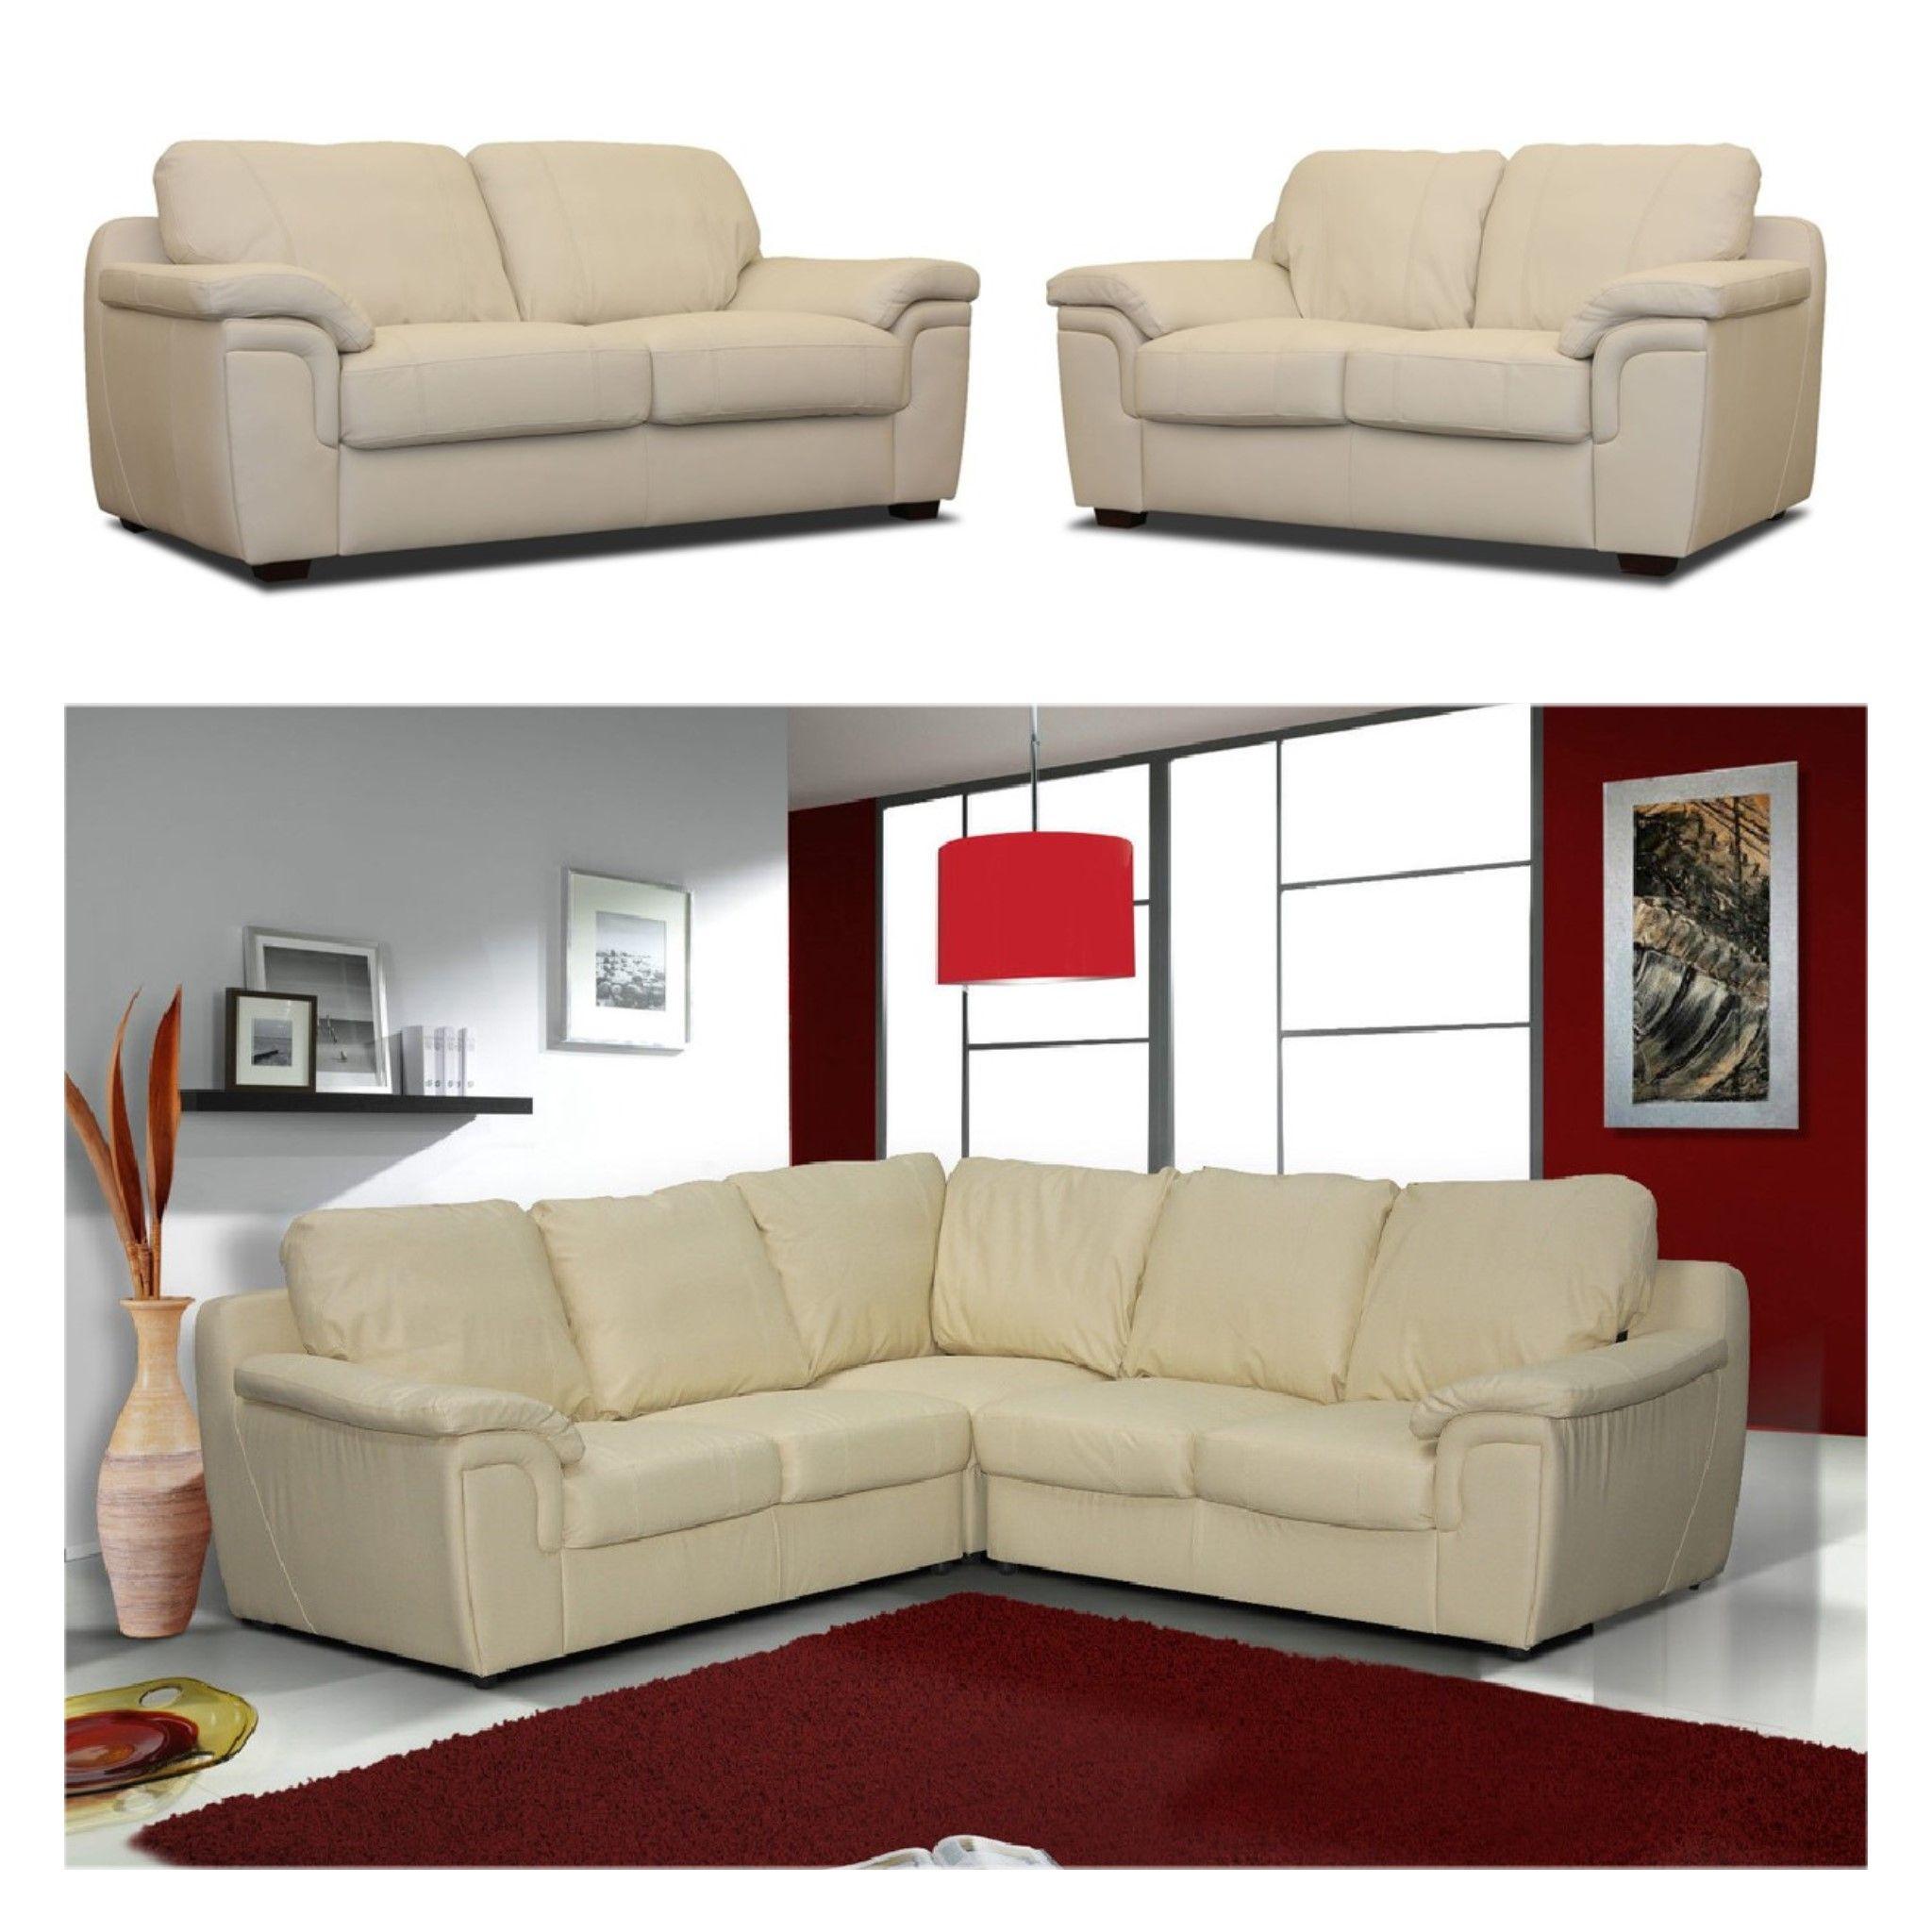 Amy 3 2 Seater Sofas 2c2 Corner Sofa Cream Leather Leather Corner Sofa Sofa Set Sofa Offers